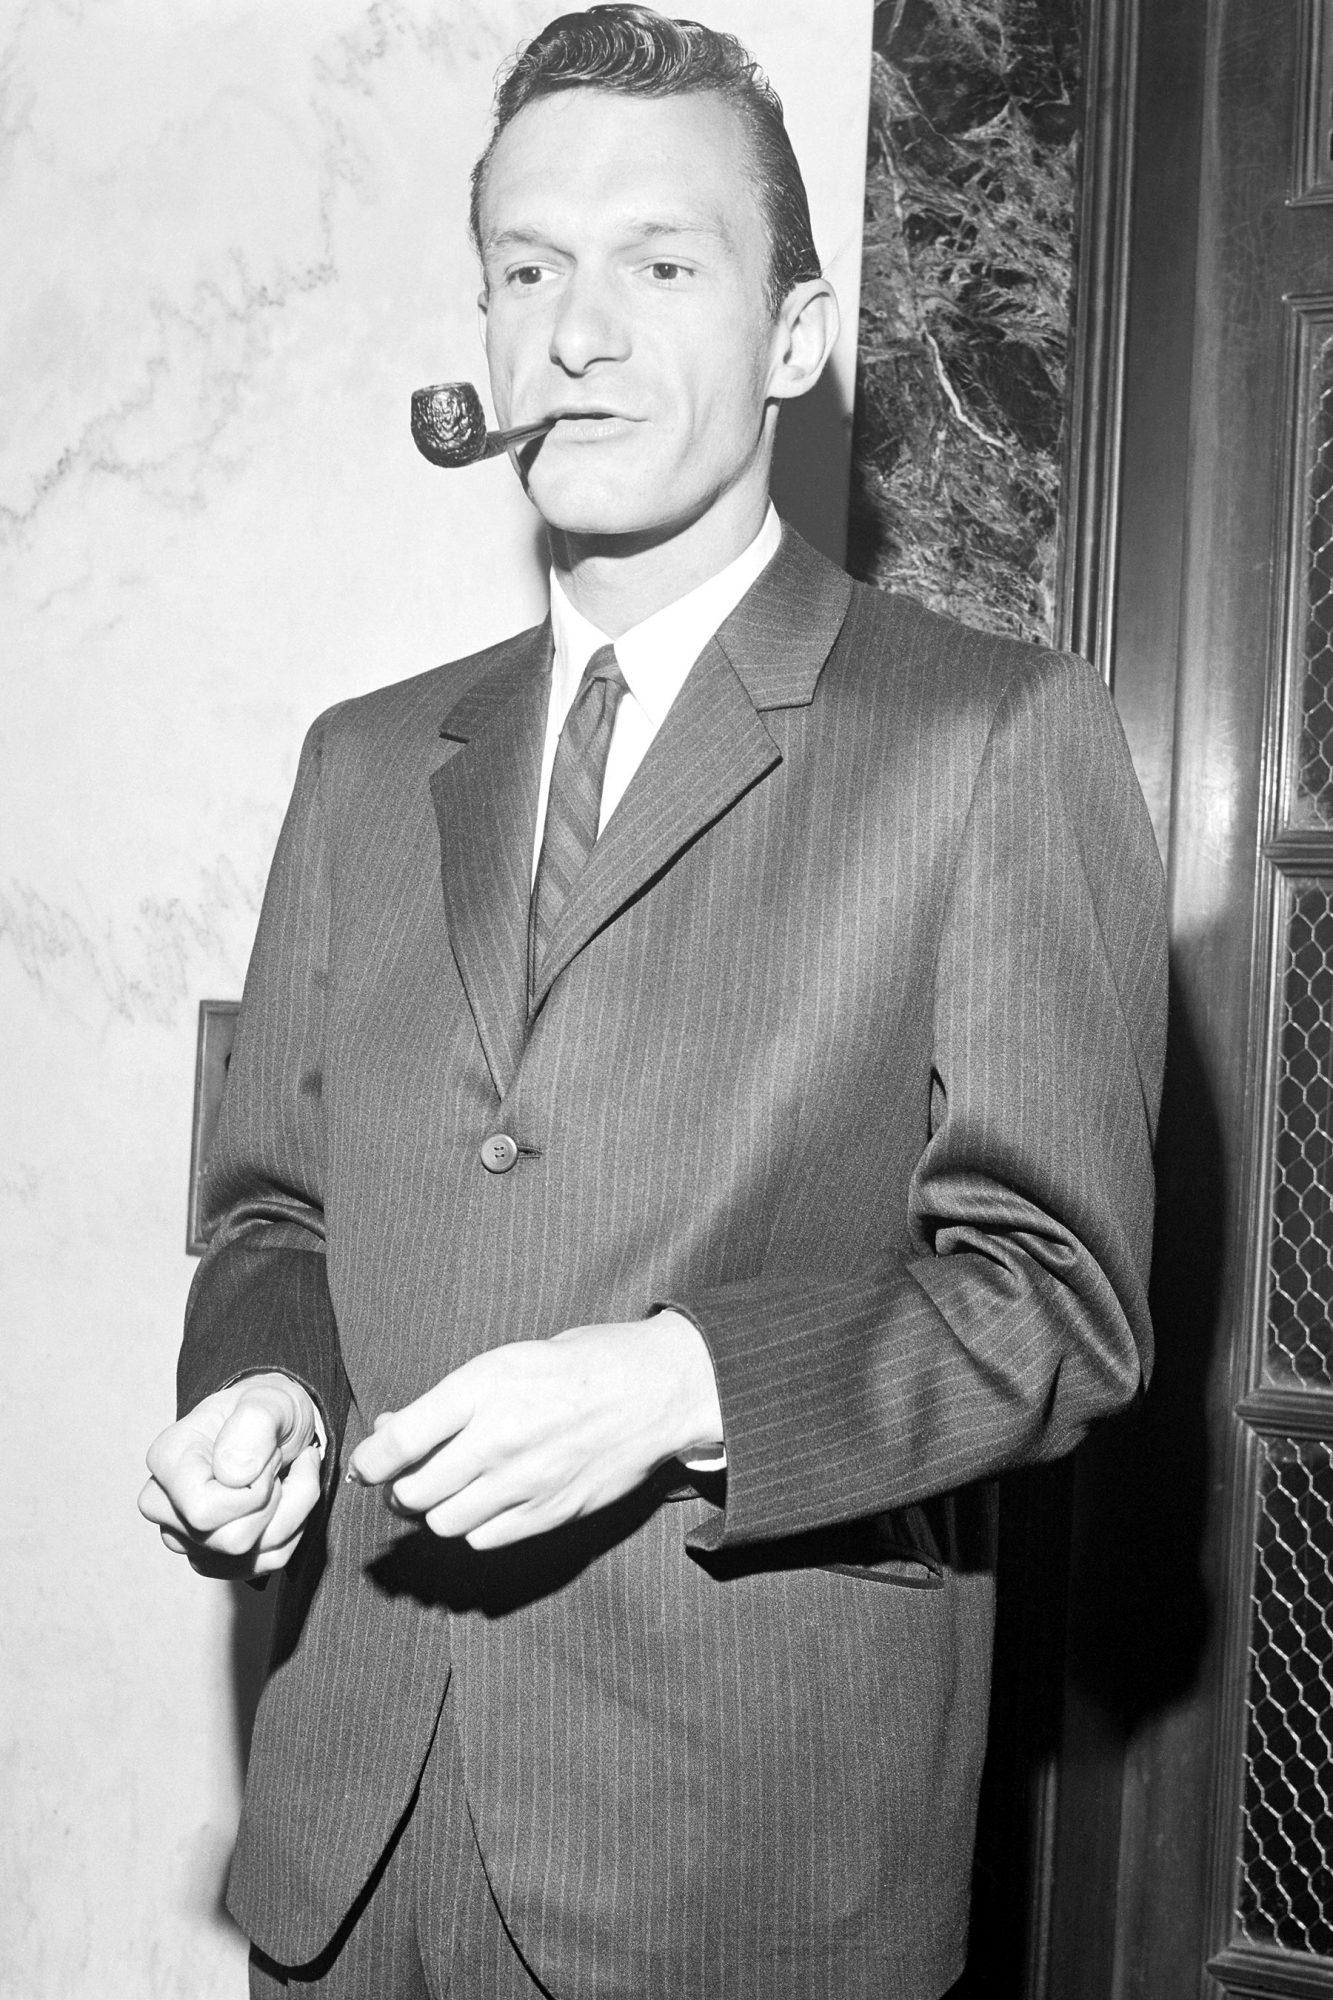 Hugh Hefner Lighting Pipe